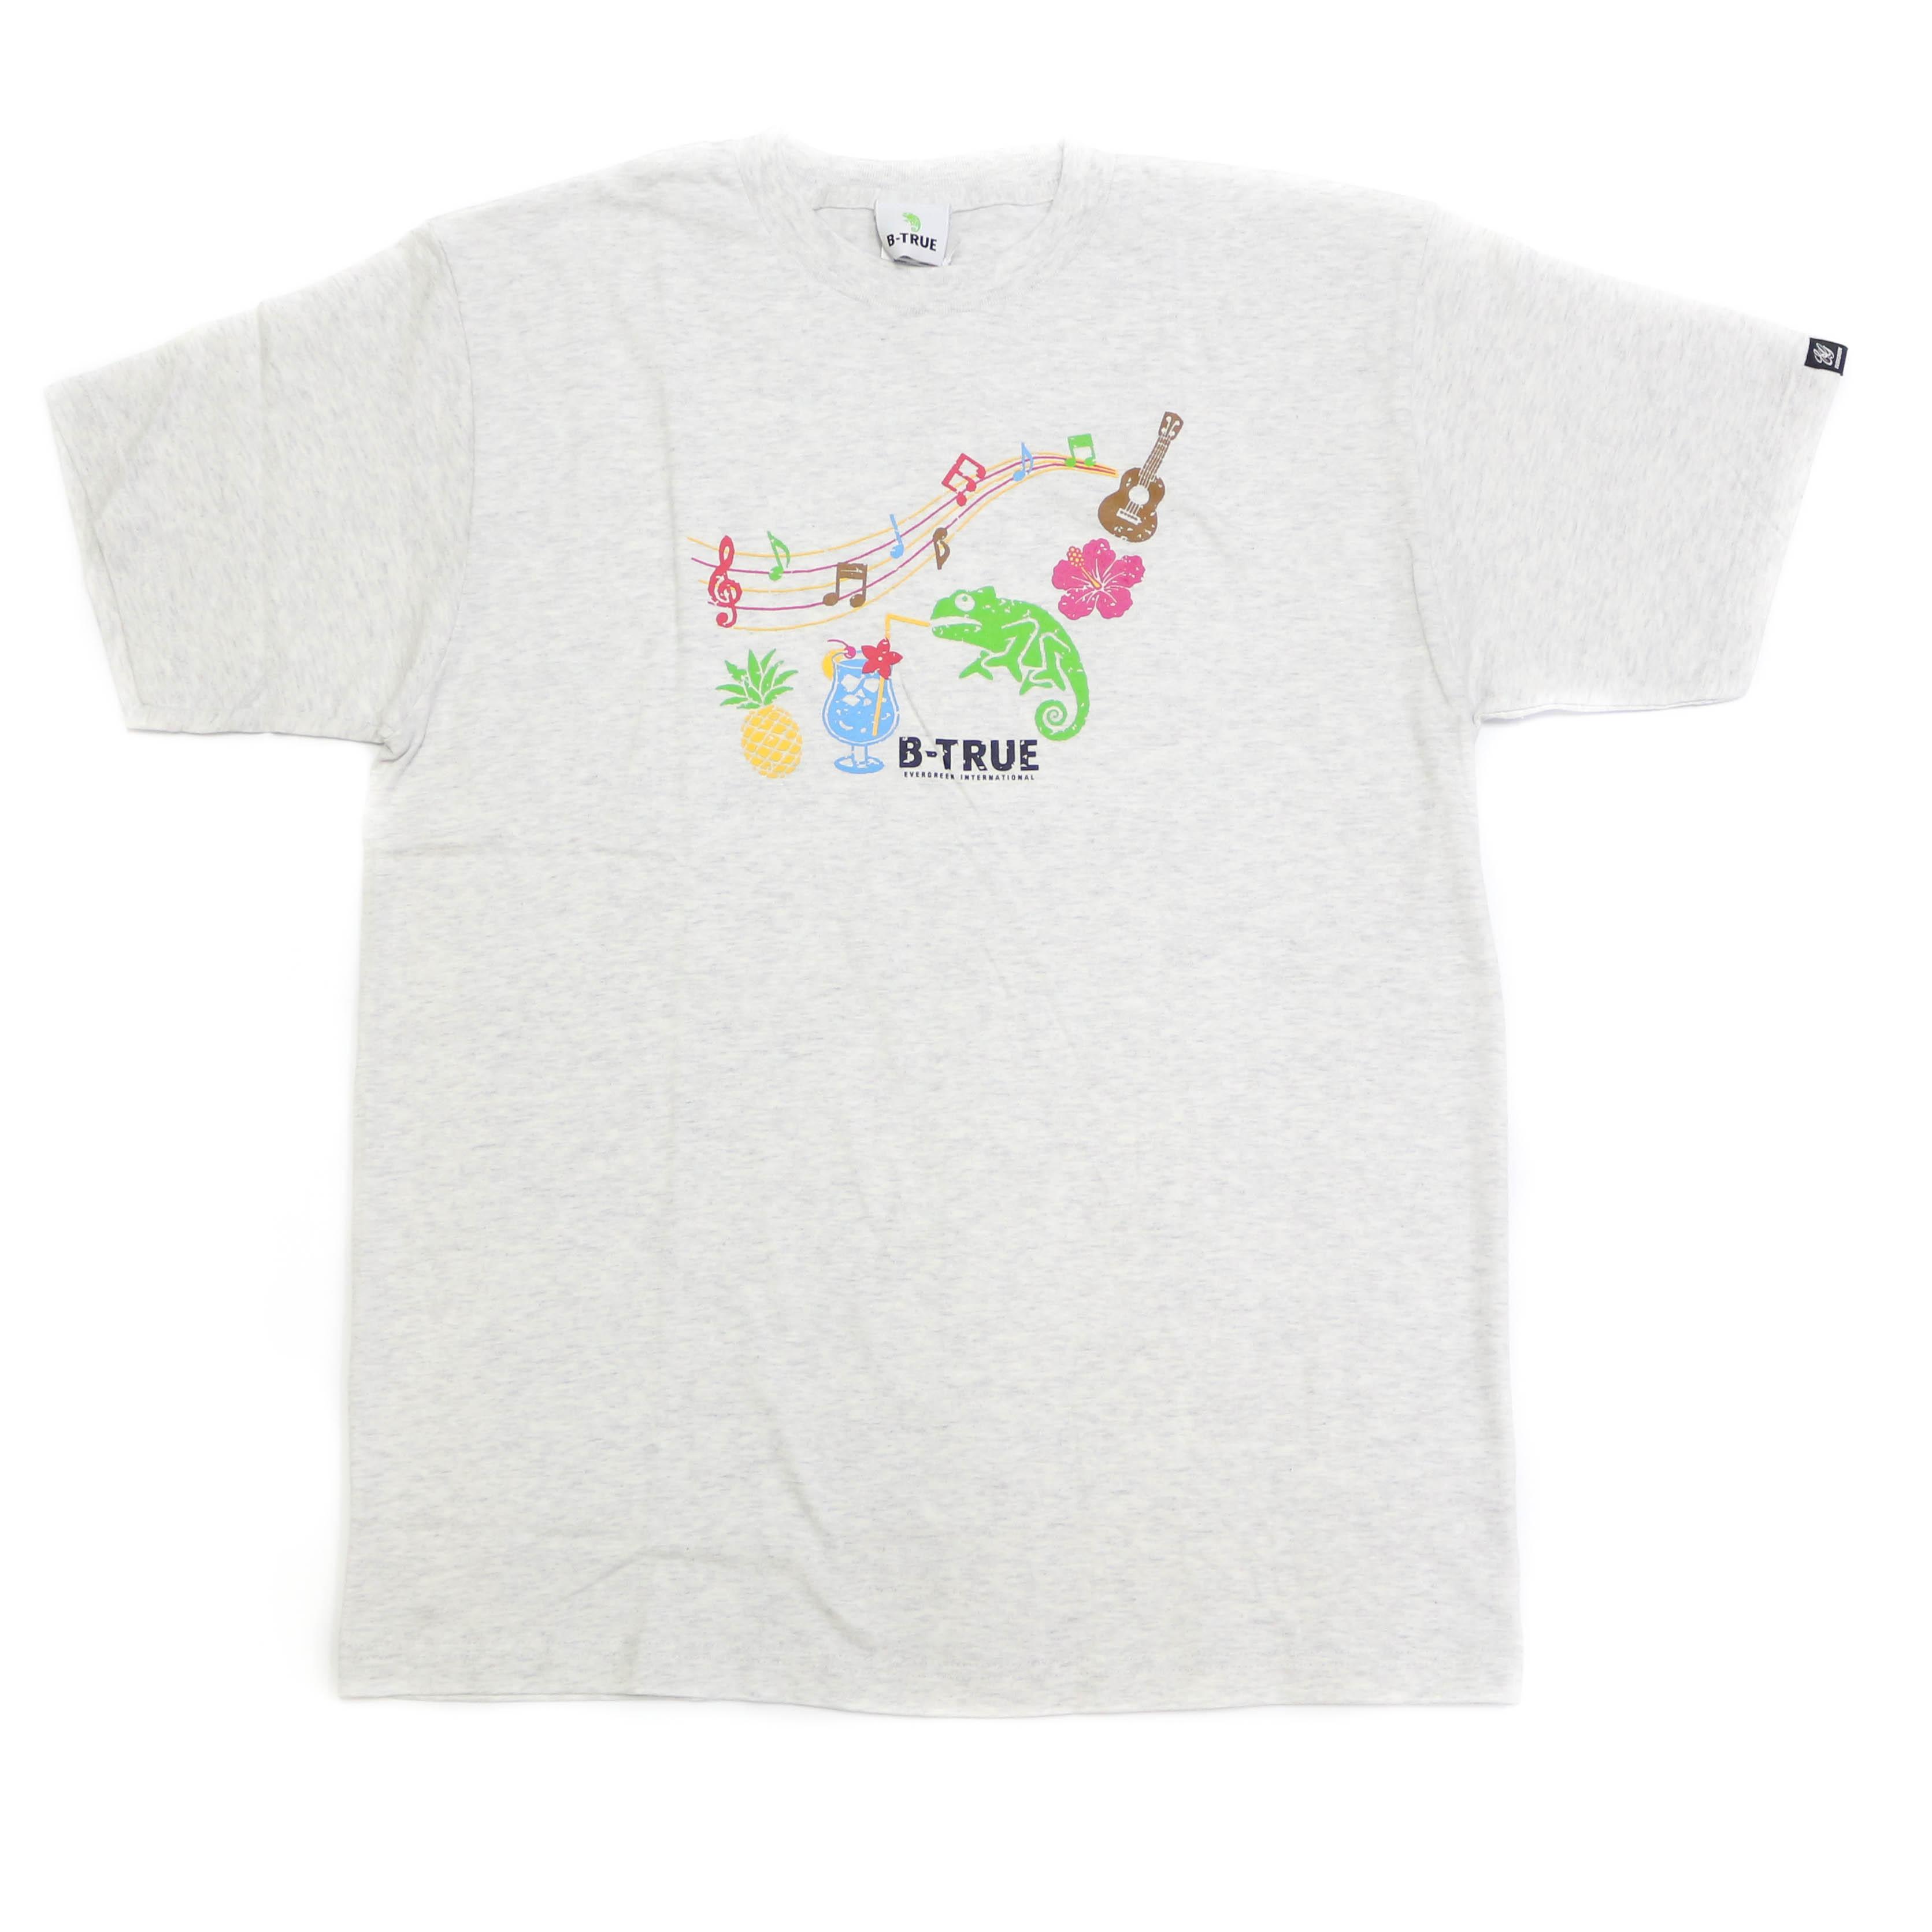 Evergreen T-Shirt Short Sleeve Type 1 Size L Ash (0755)